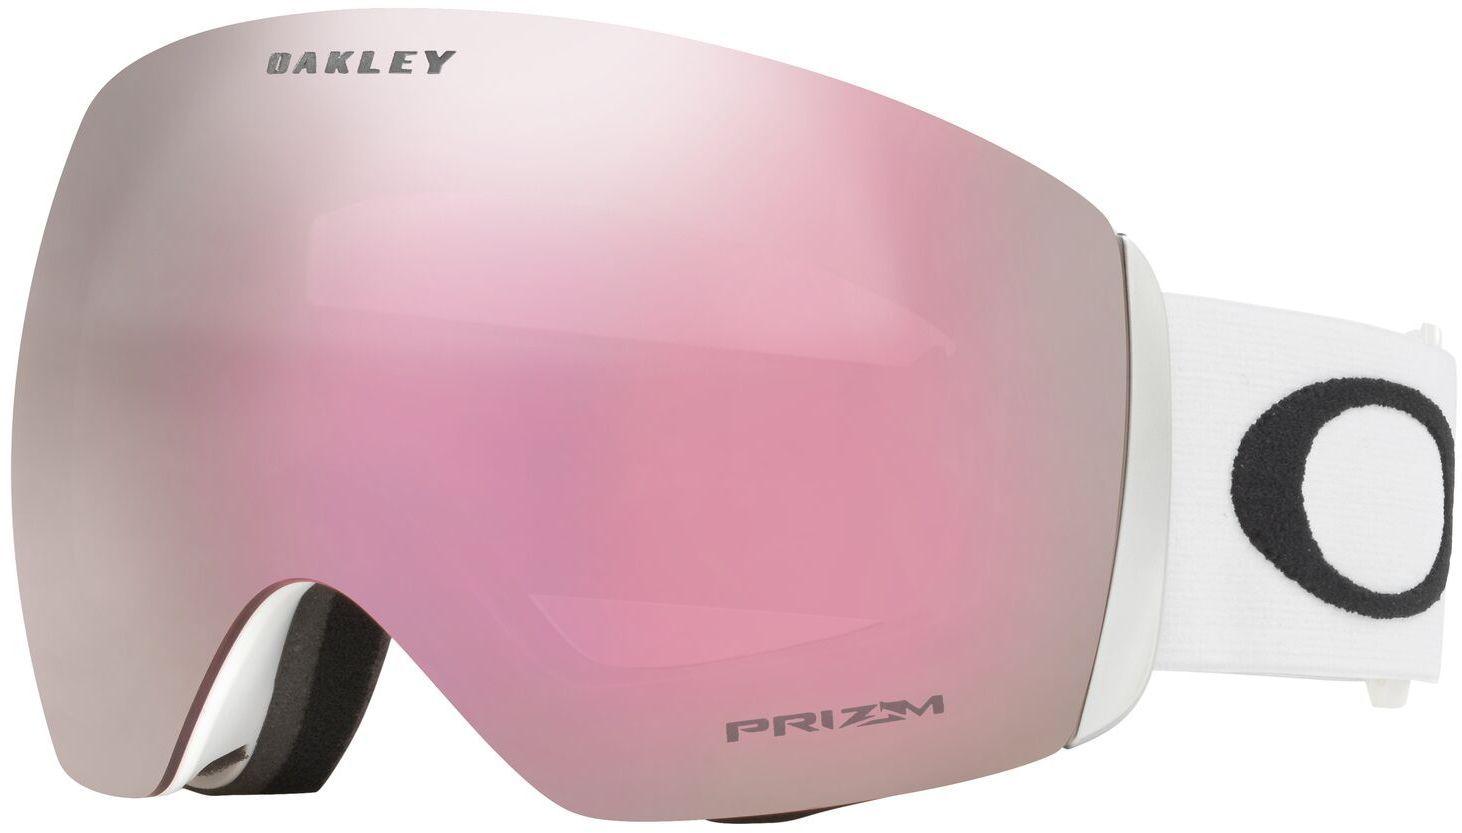 Oakley Flight Deck - Matte White/Prizm Hi Pink Iridium uni